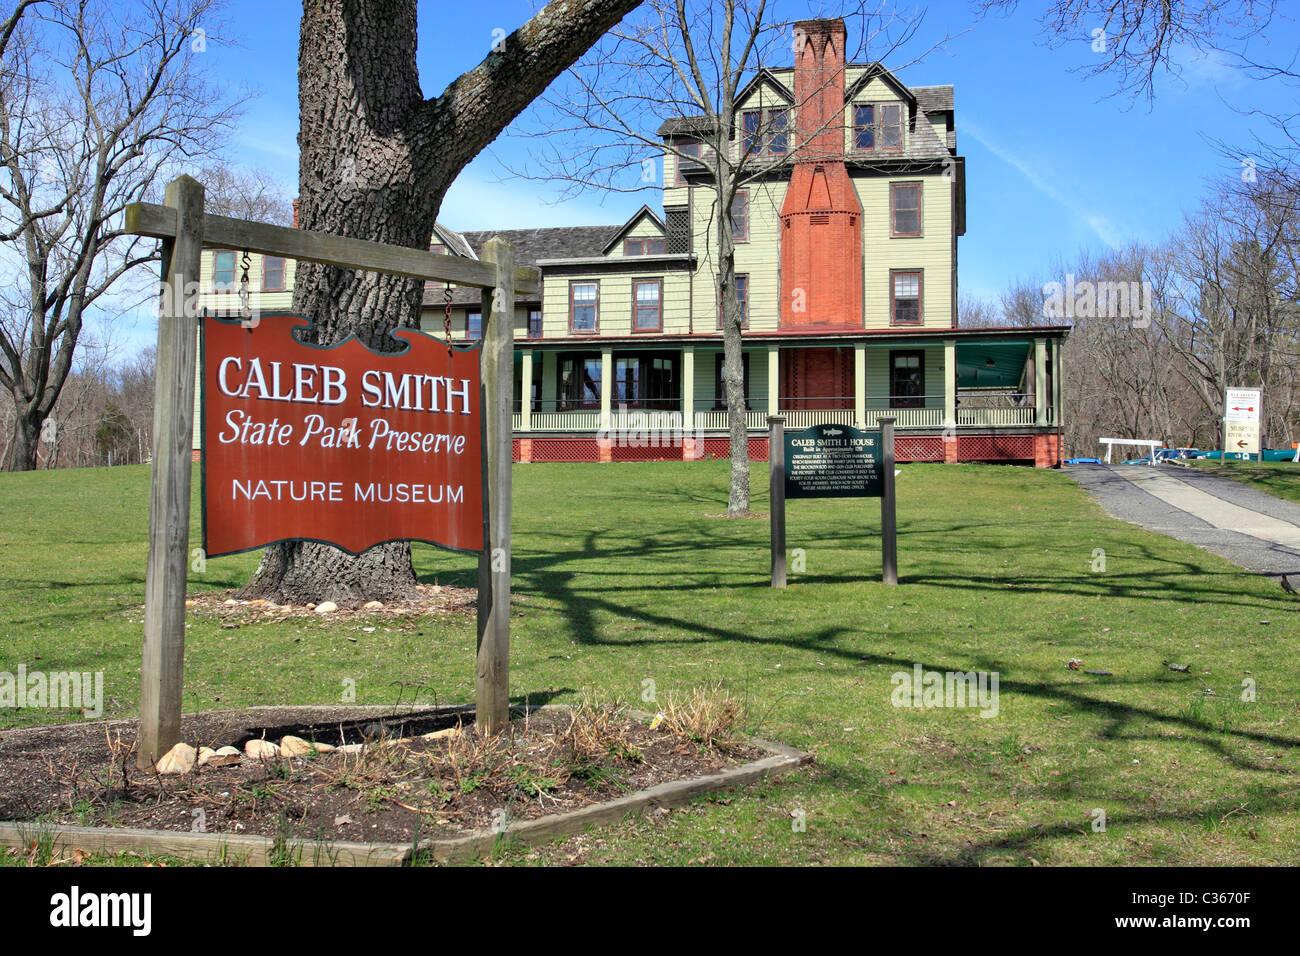 Caleb Smith State Park Preserve Nature Museum